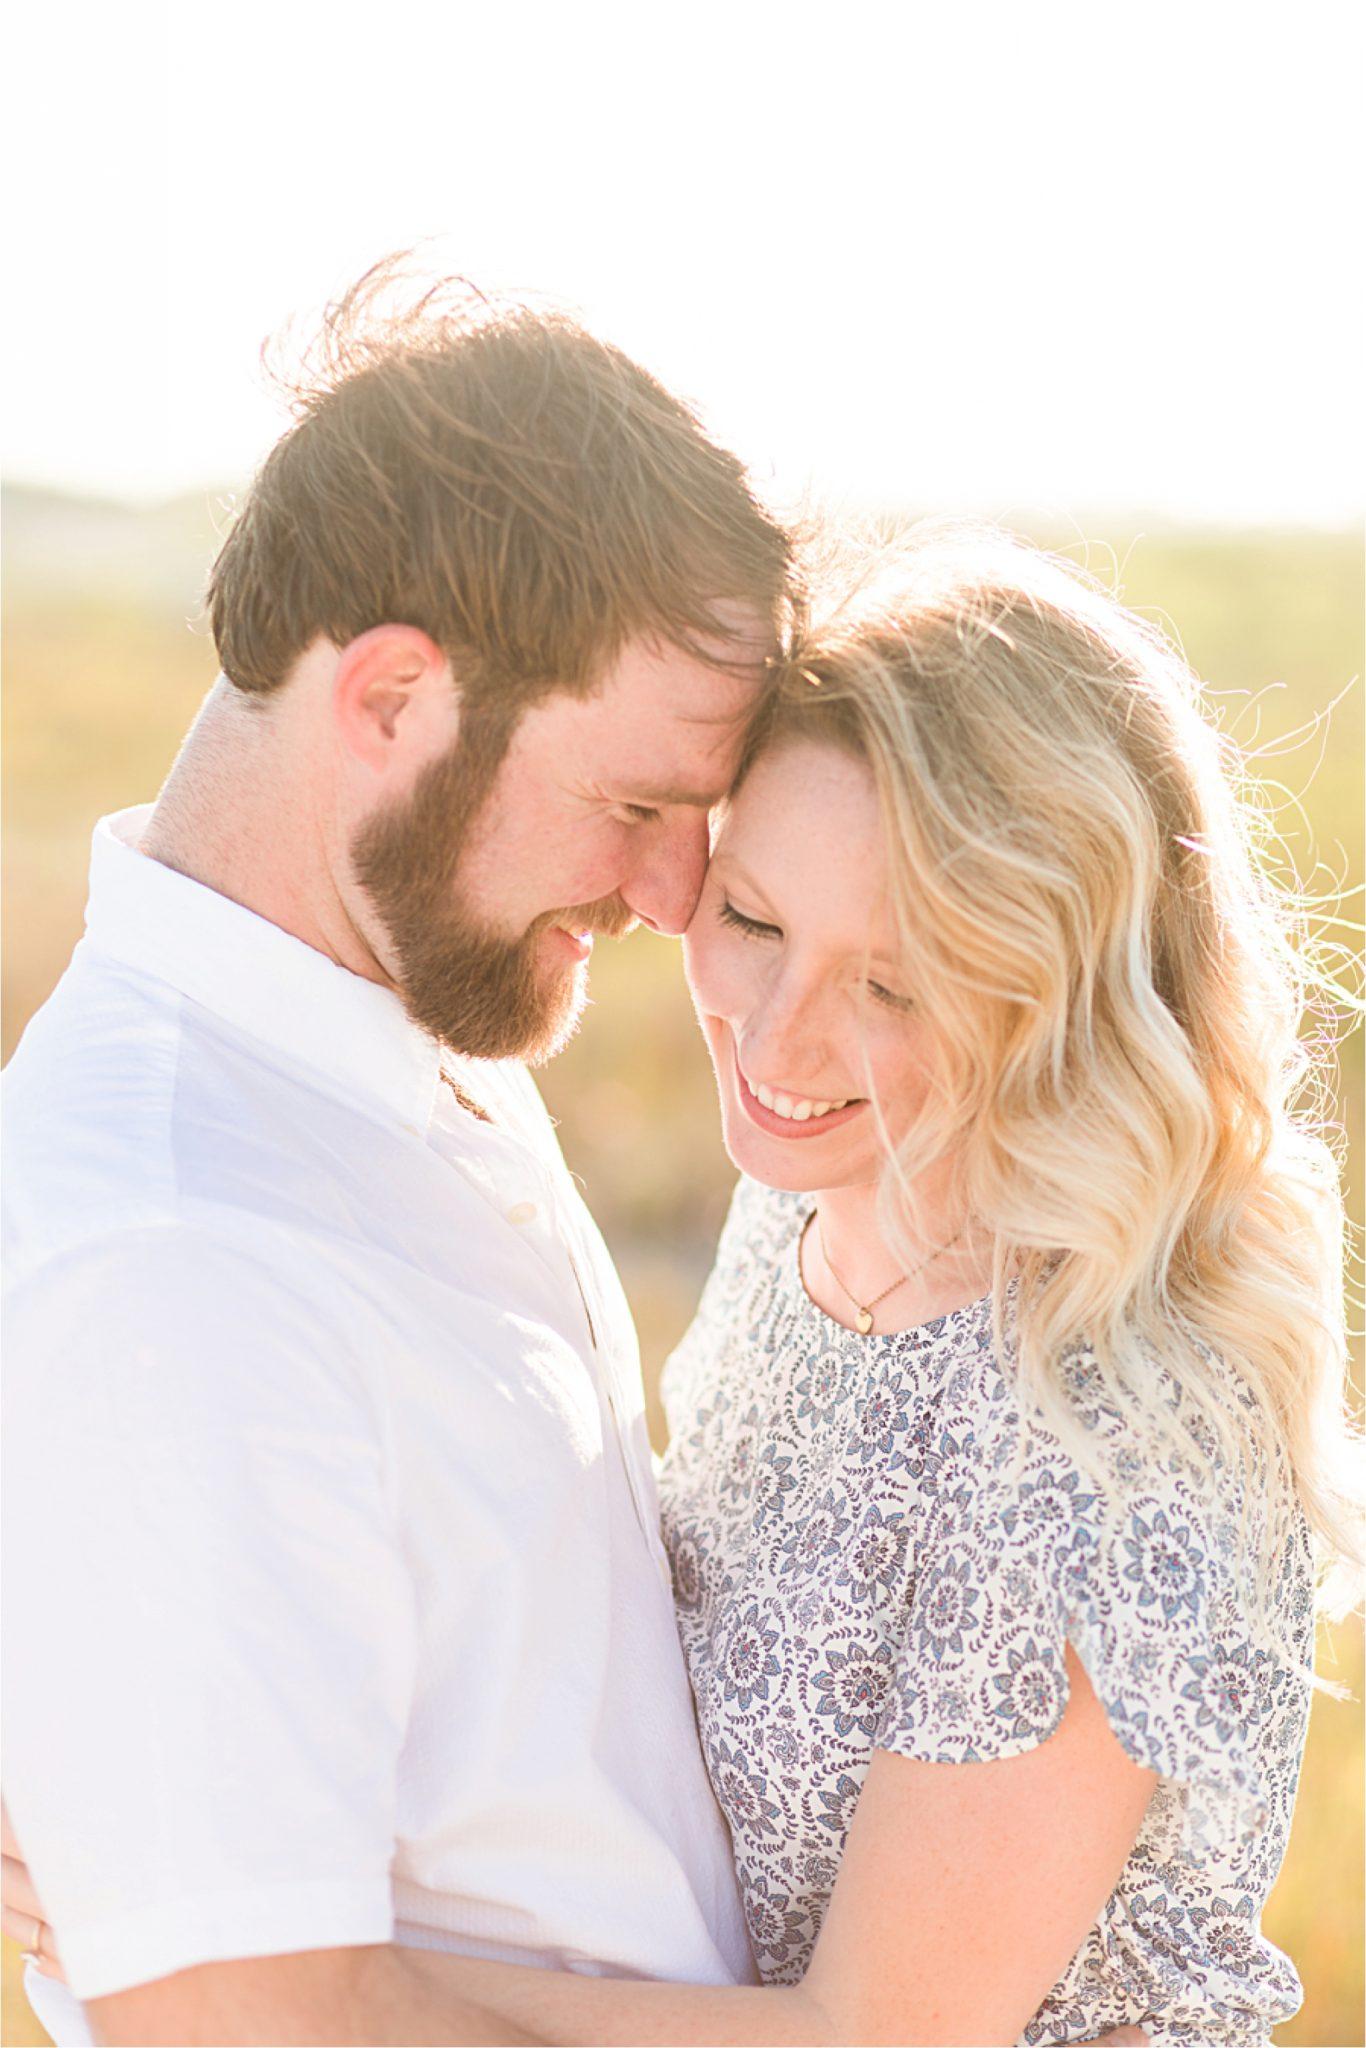 Beach engagement photos, Daulphin Island, Mobile wedding photographer, Candid couples, Romantic engagement shoot inspiration